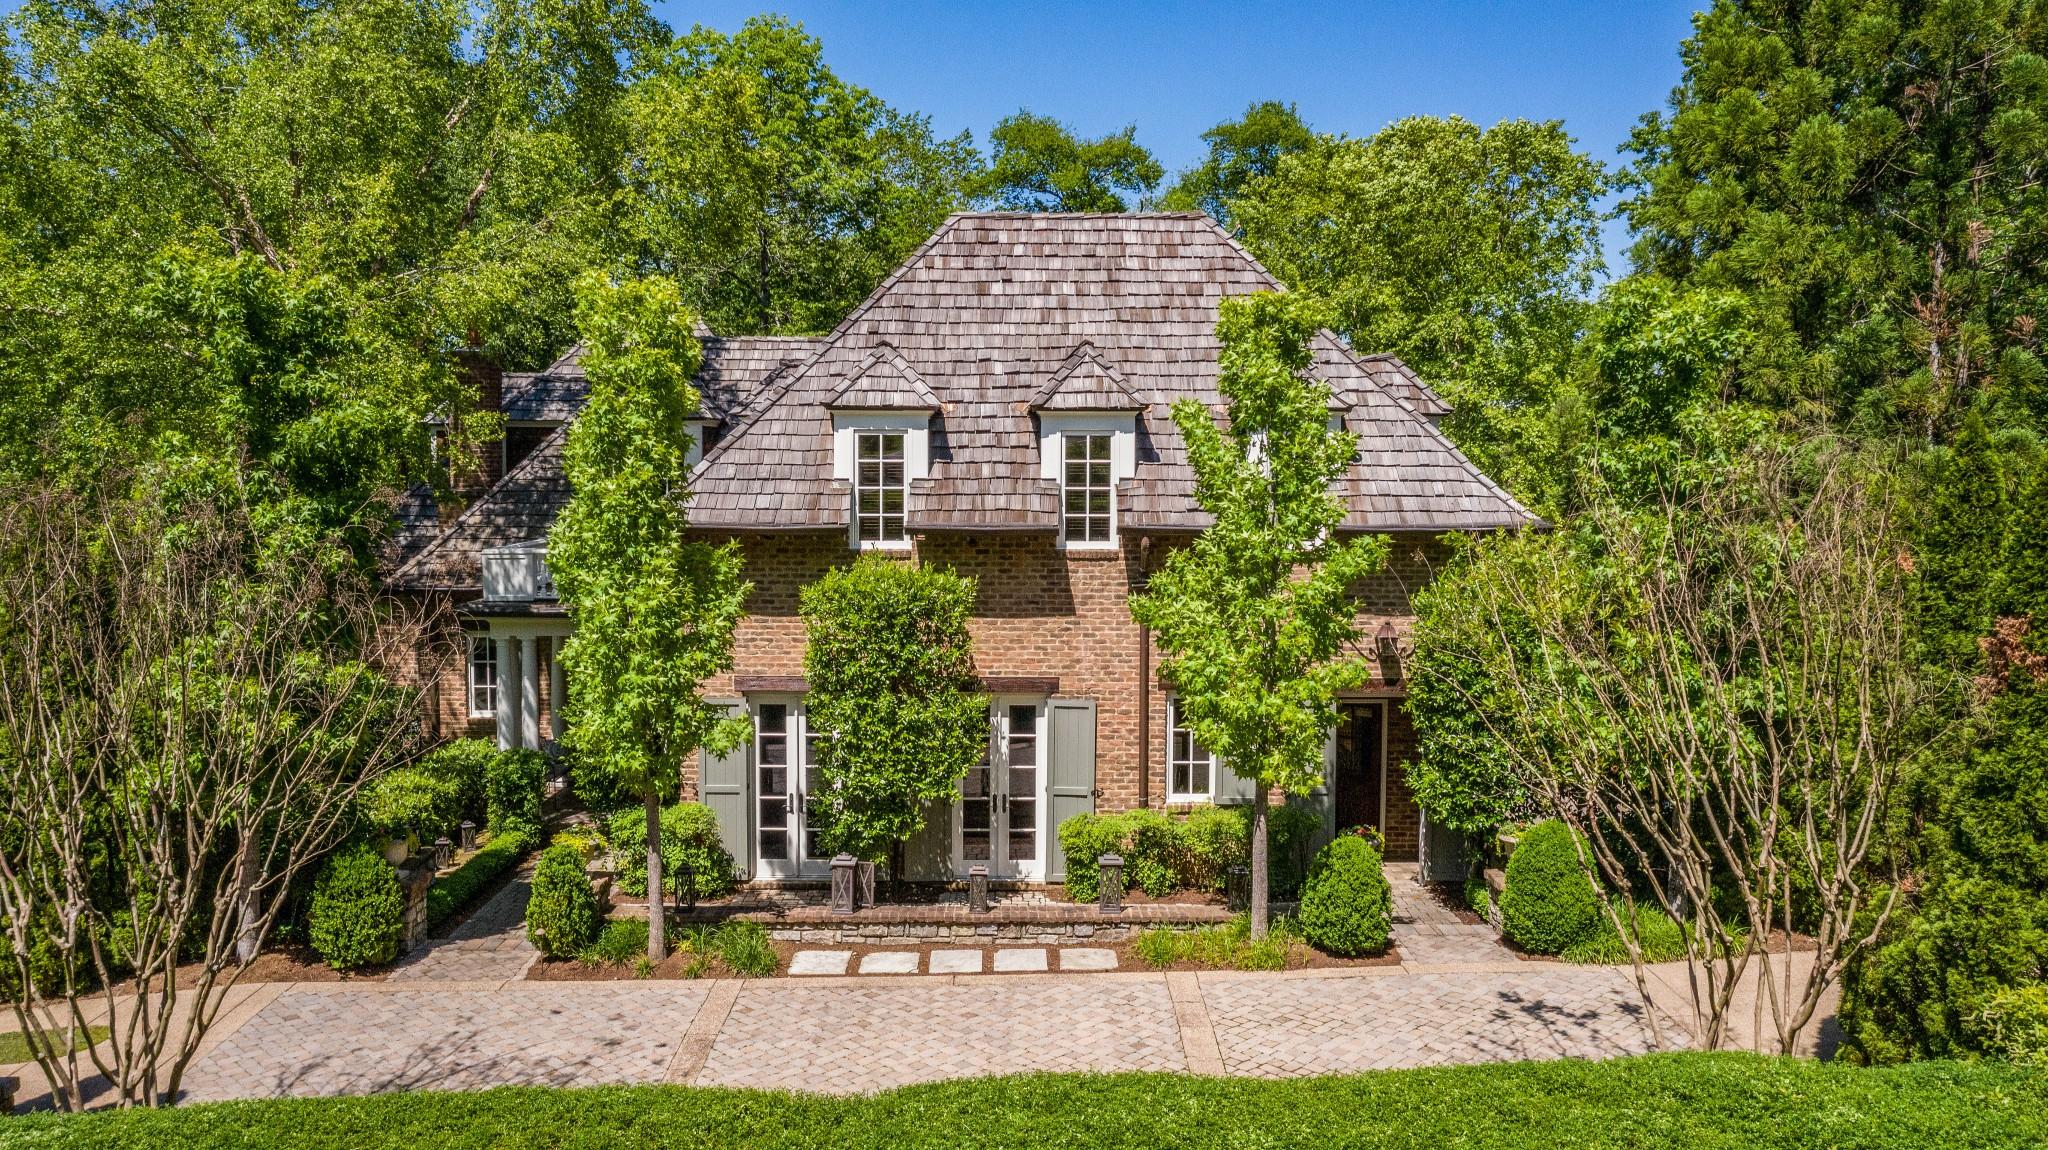 504 Westview Ave, Nashville, TN 37205 - Nashville, TN real estate listing